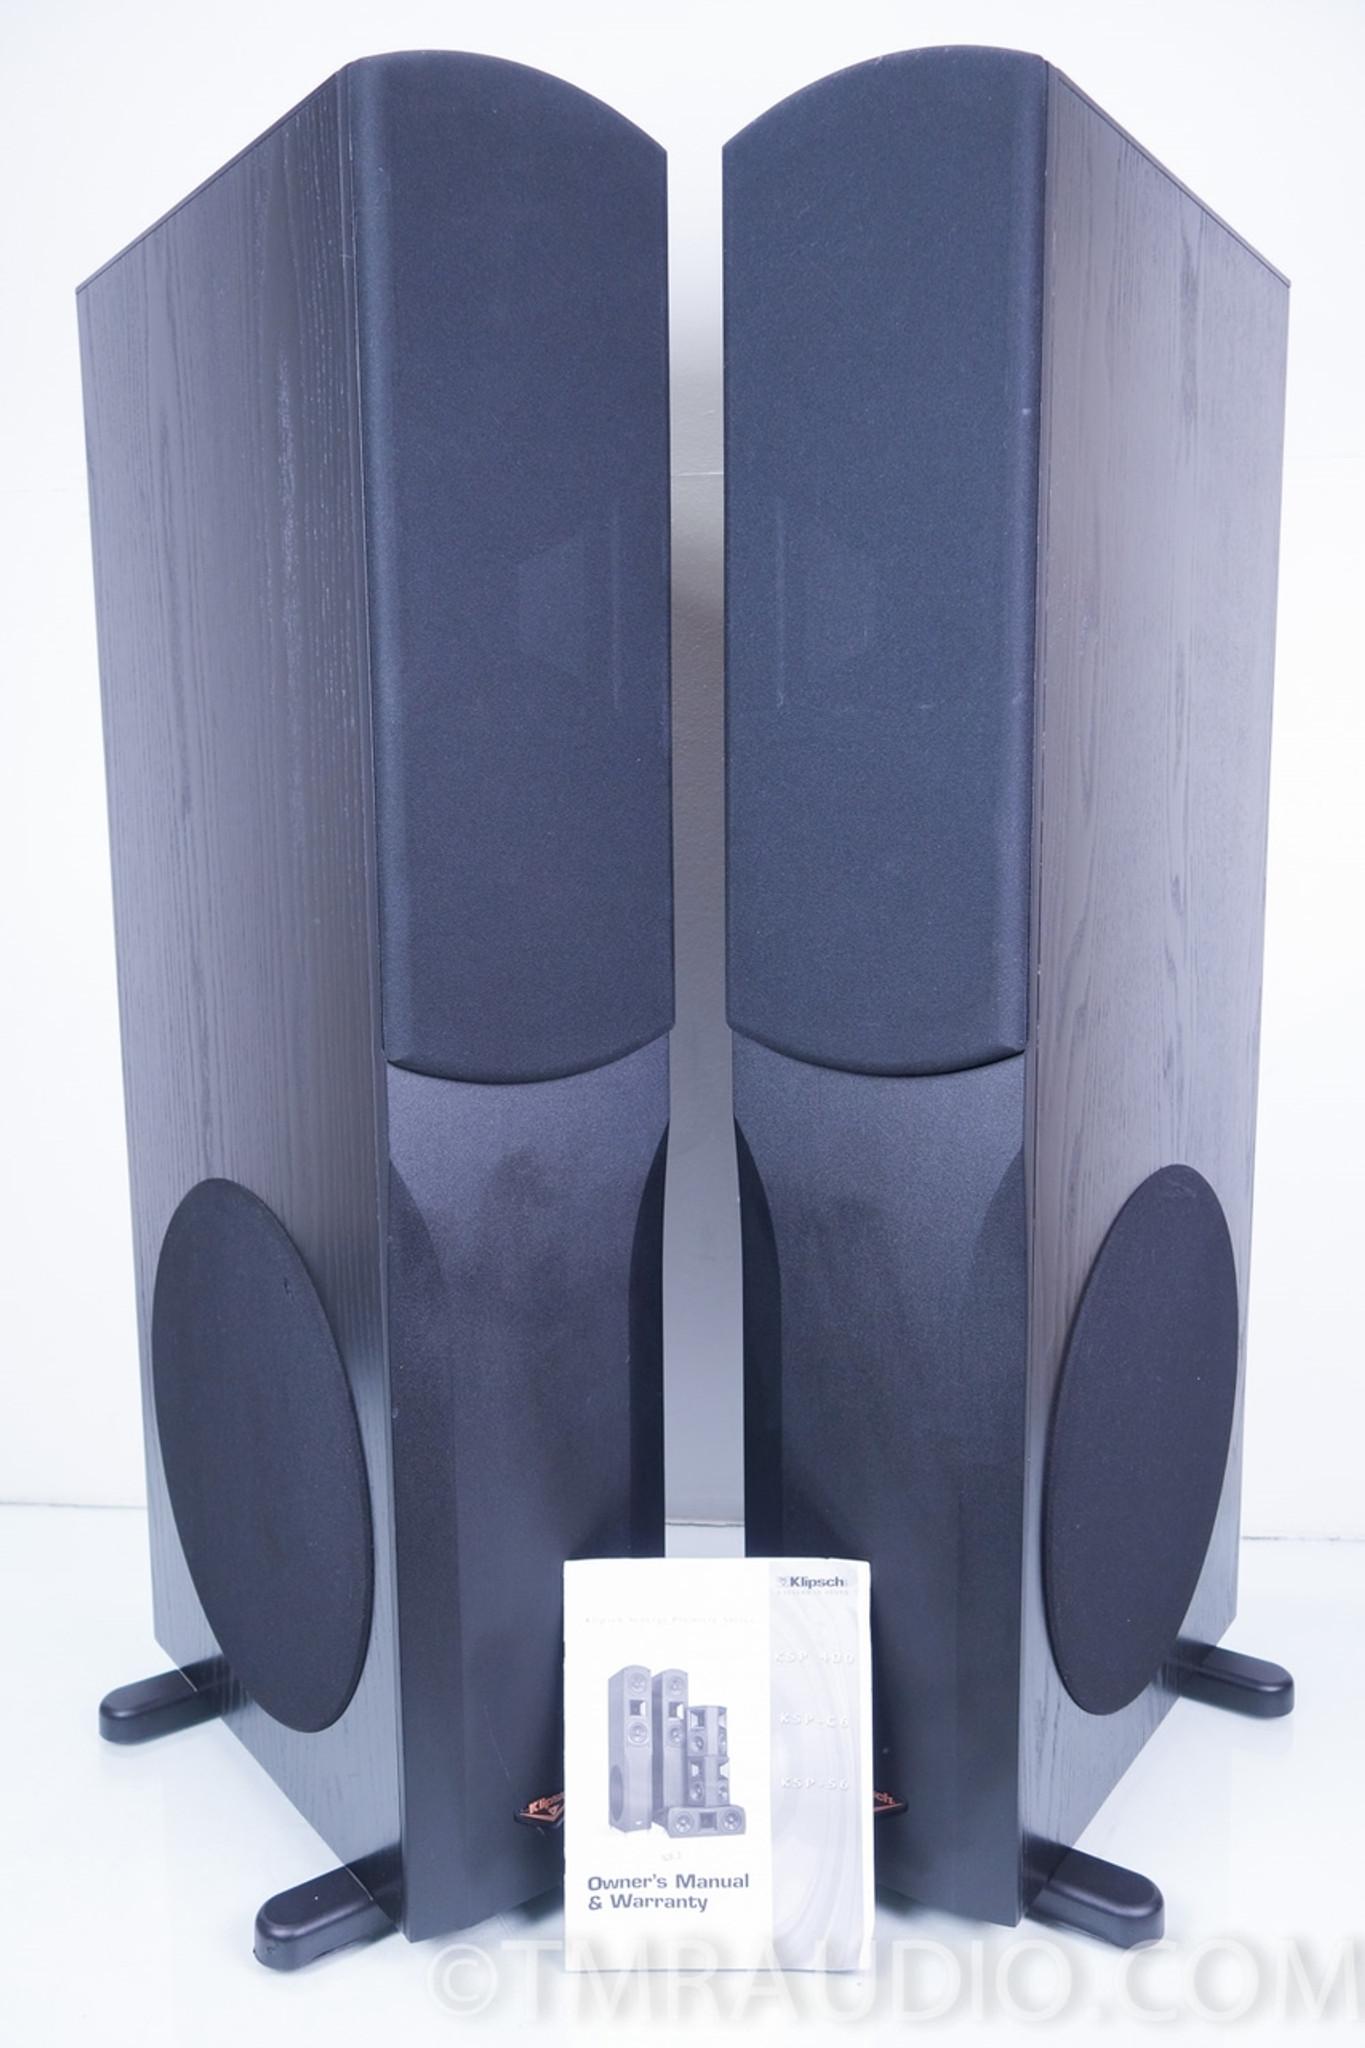 Klipsch KSP-400 Speakers - The Music Room